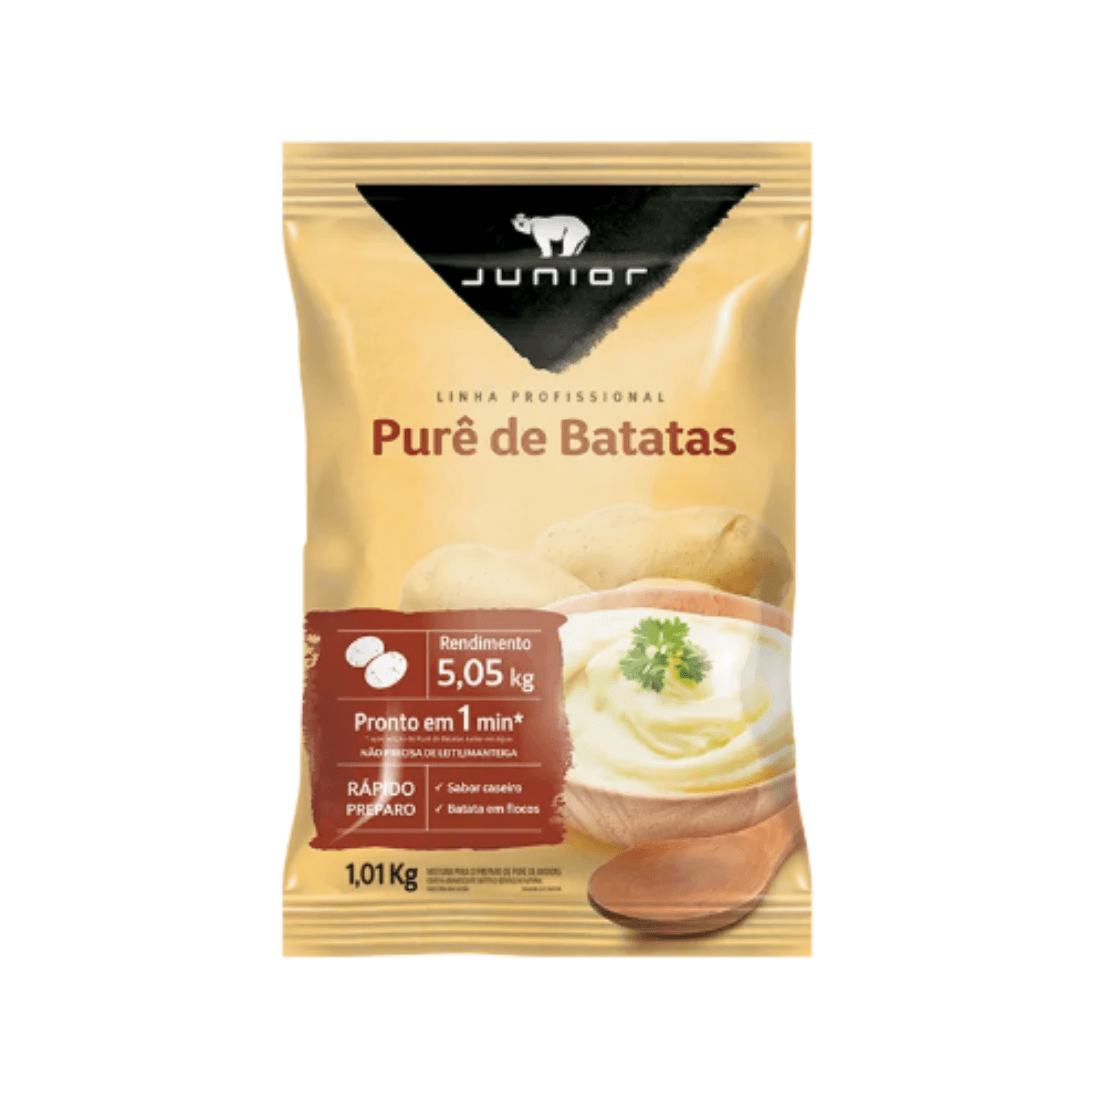 PURÊ DE BATATA JUNIOR 1KG